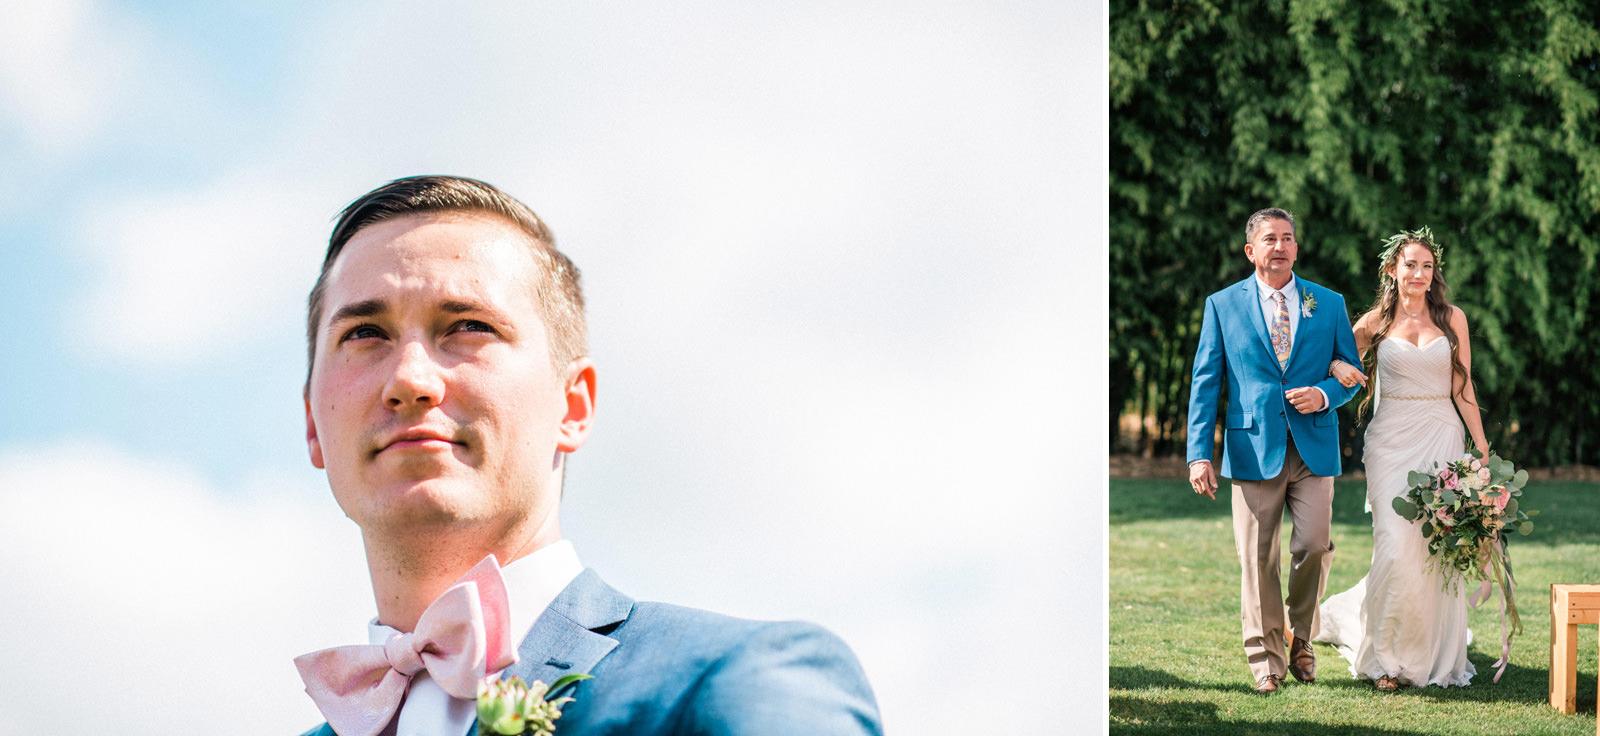 038-woodinville-lavendar-farm-wedding-with-golden-glowy-photos.jpg